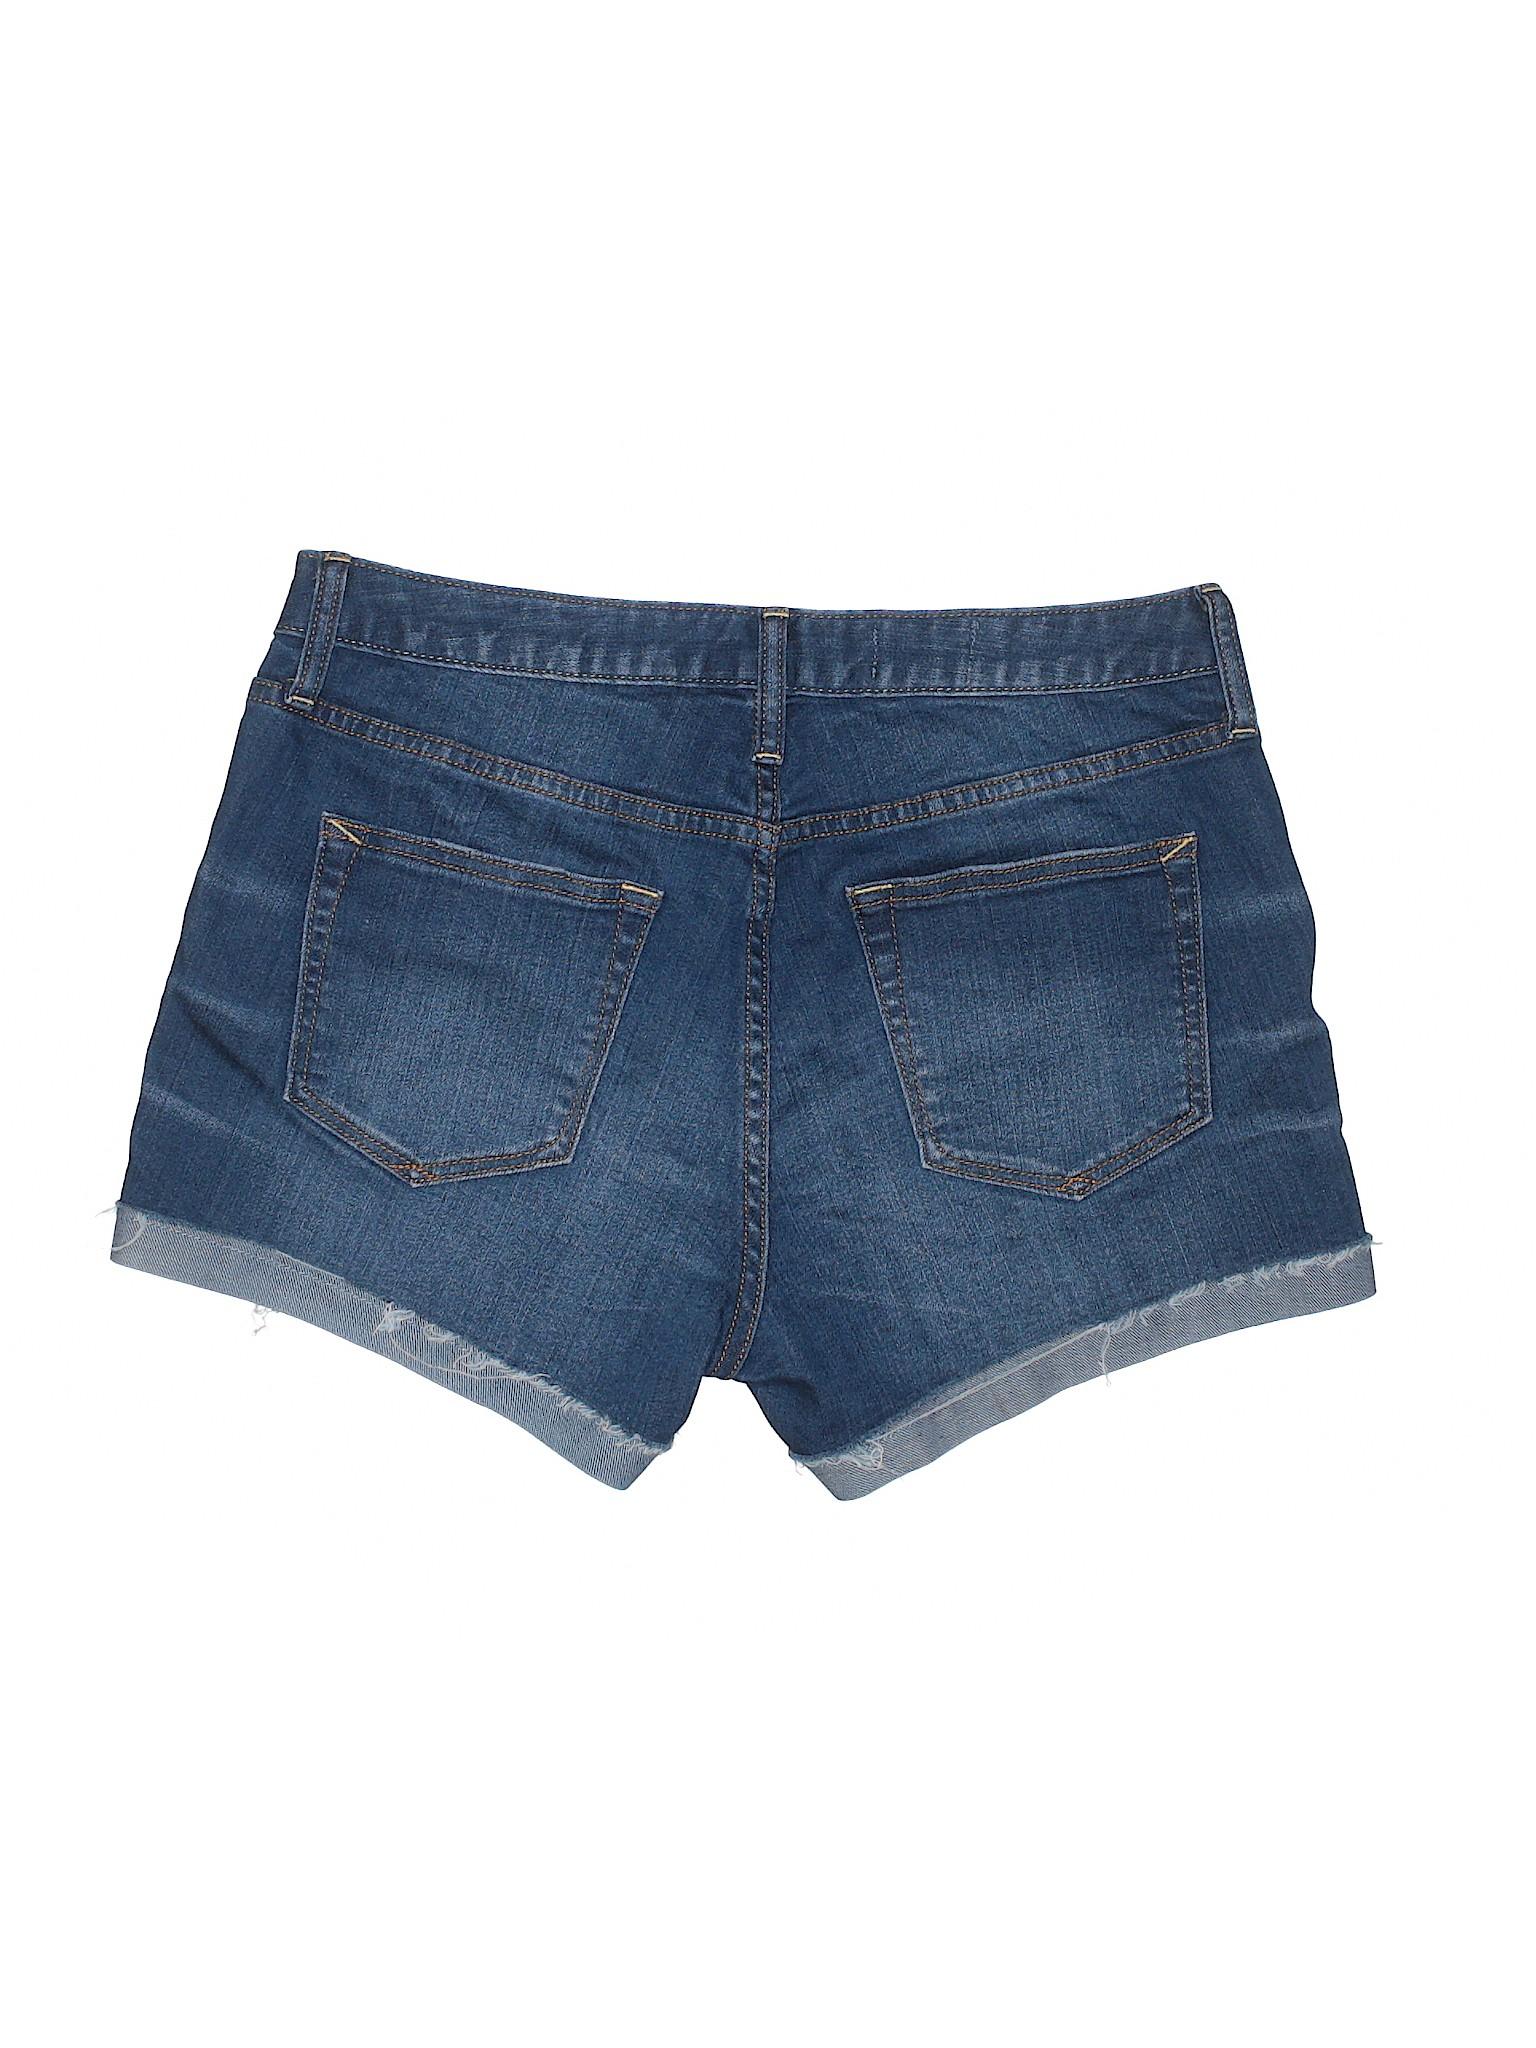 Boutique Denim Boutique Shorts Boutique Shorts Gap Gap Denim 4ZBWqnE